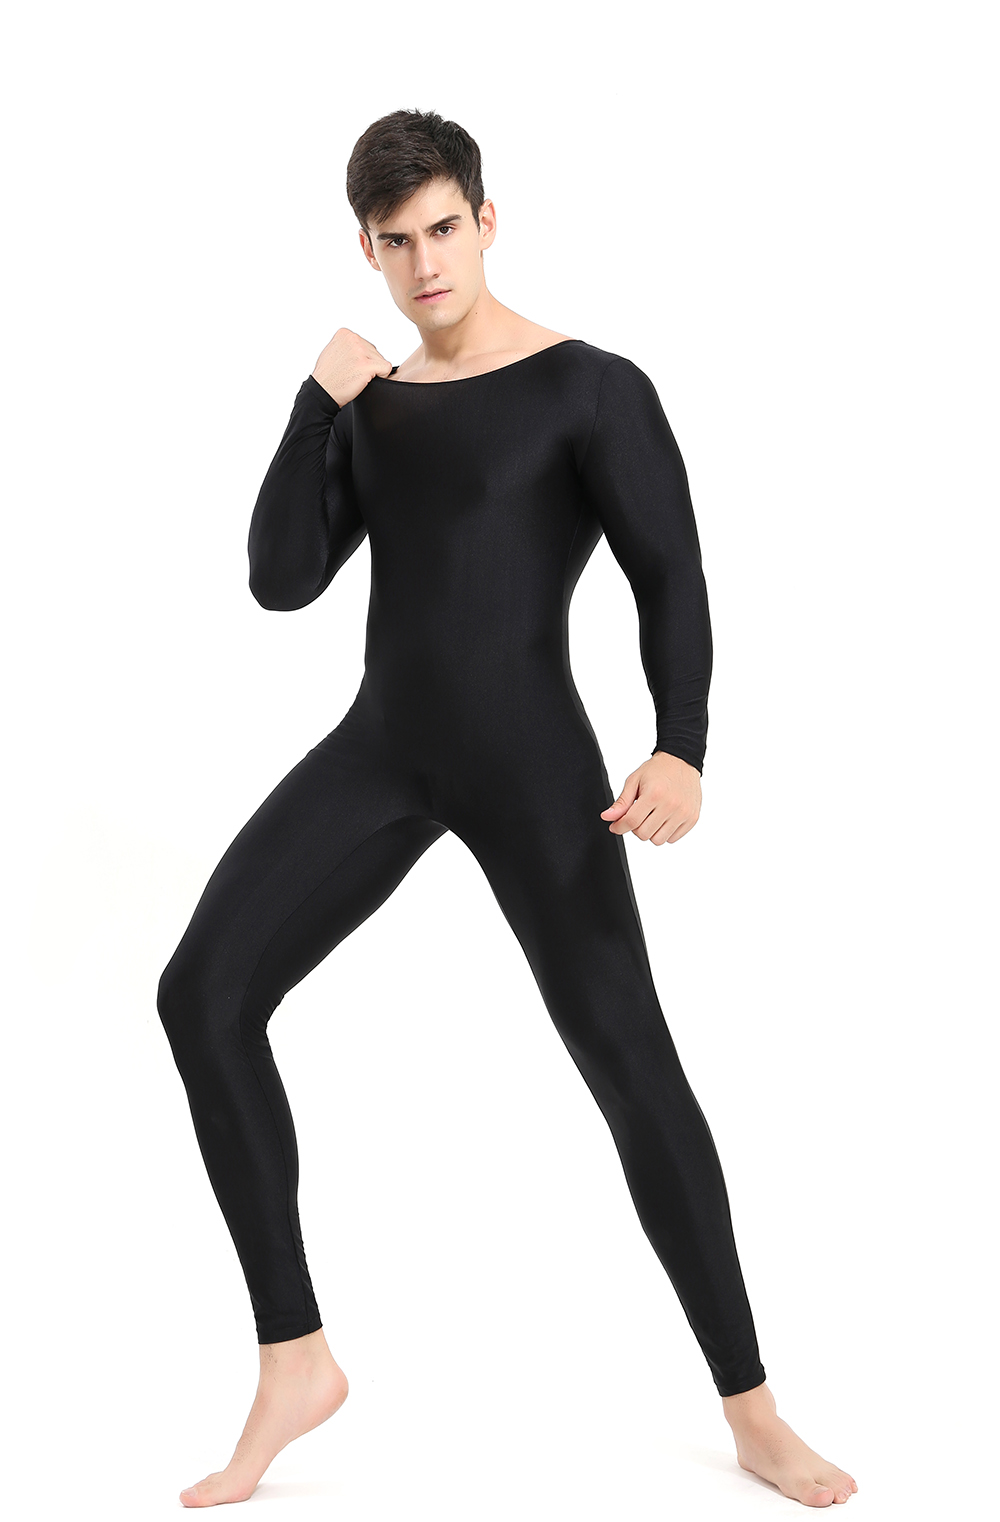 SPEERISE Mans Black Long Sleeve Unitard Adult One-piece Spandex  Bodysuit Full Body Jumpsuit Dance Wear Free shipping